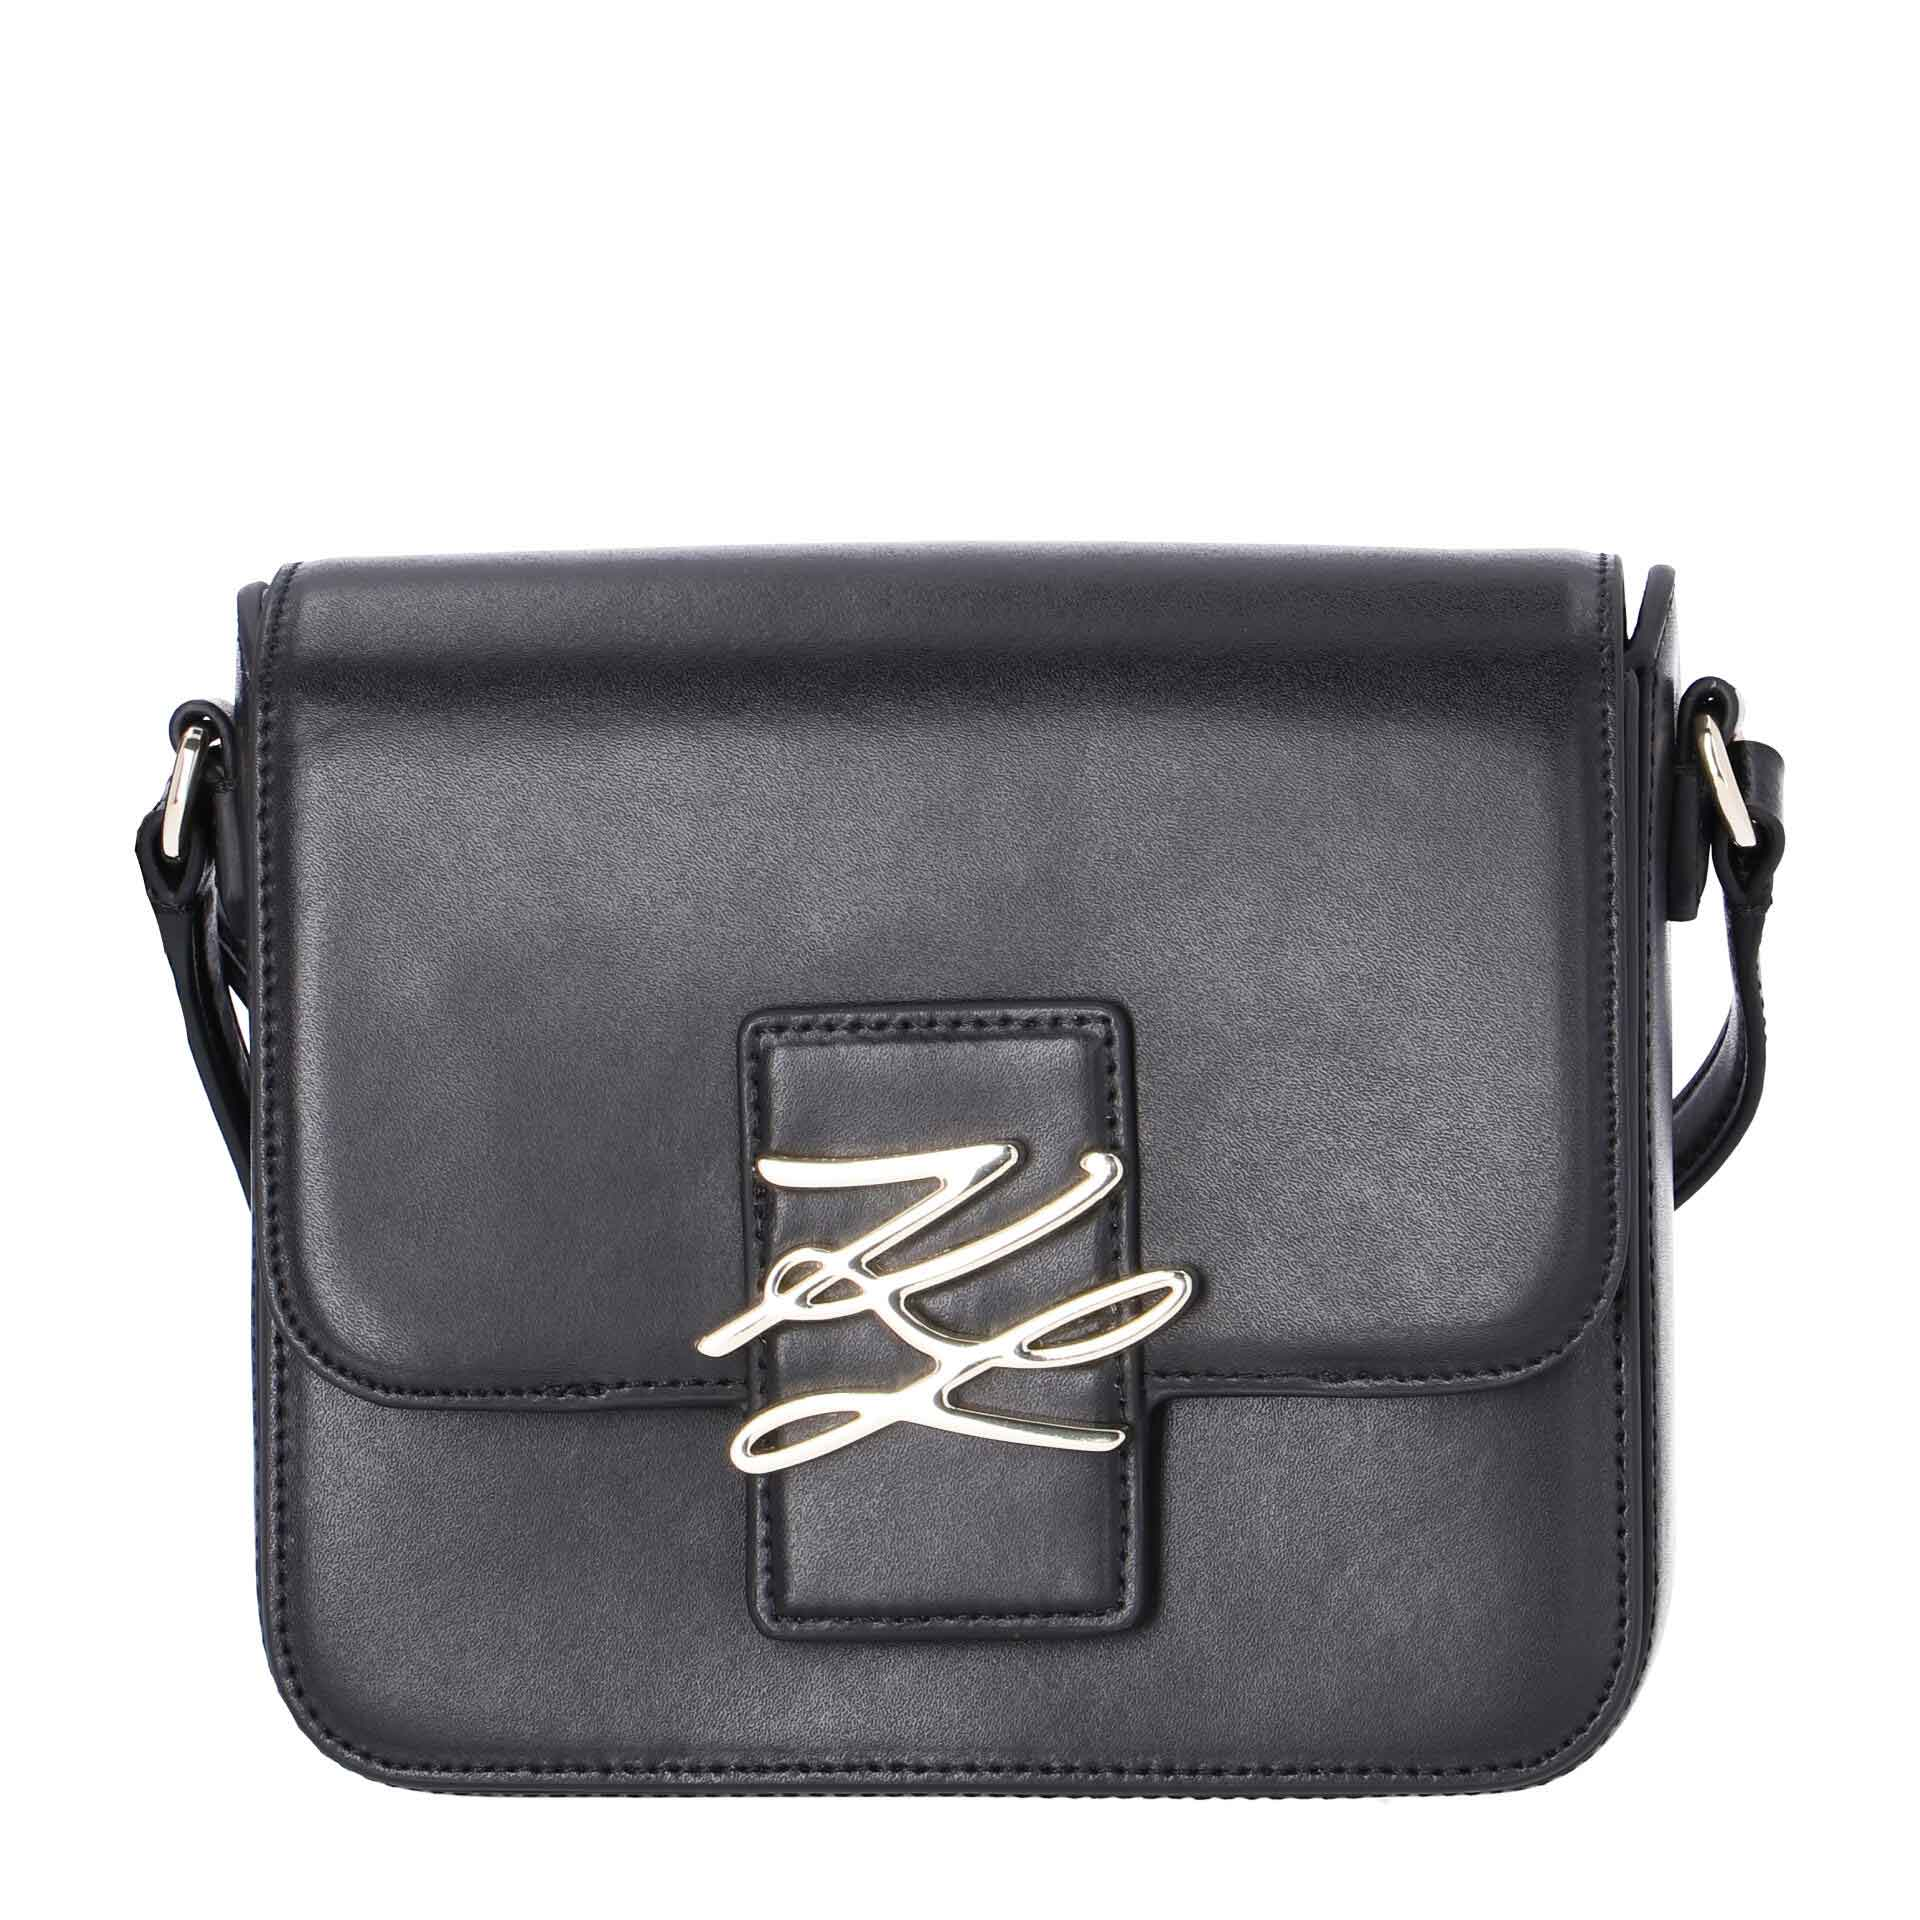 Karl Lagerfeld K/Autograph Crossbody Bag black